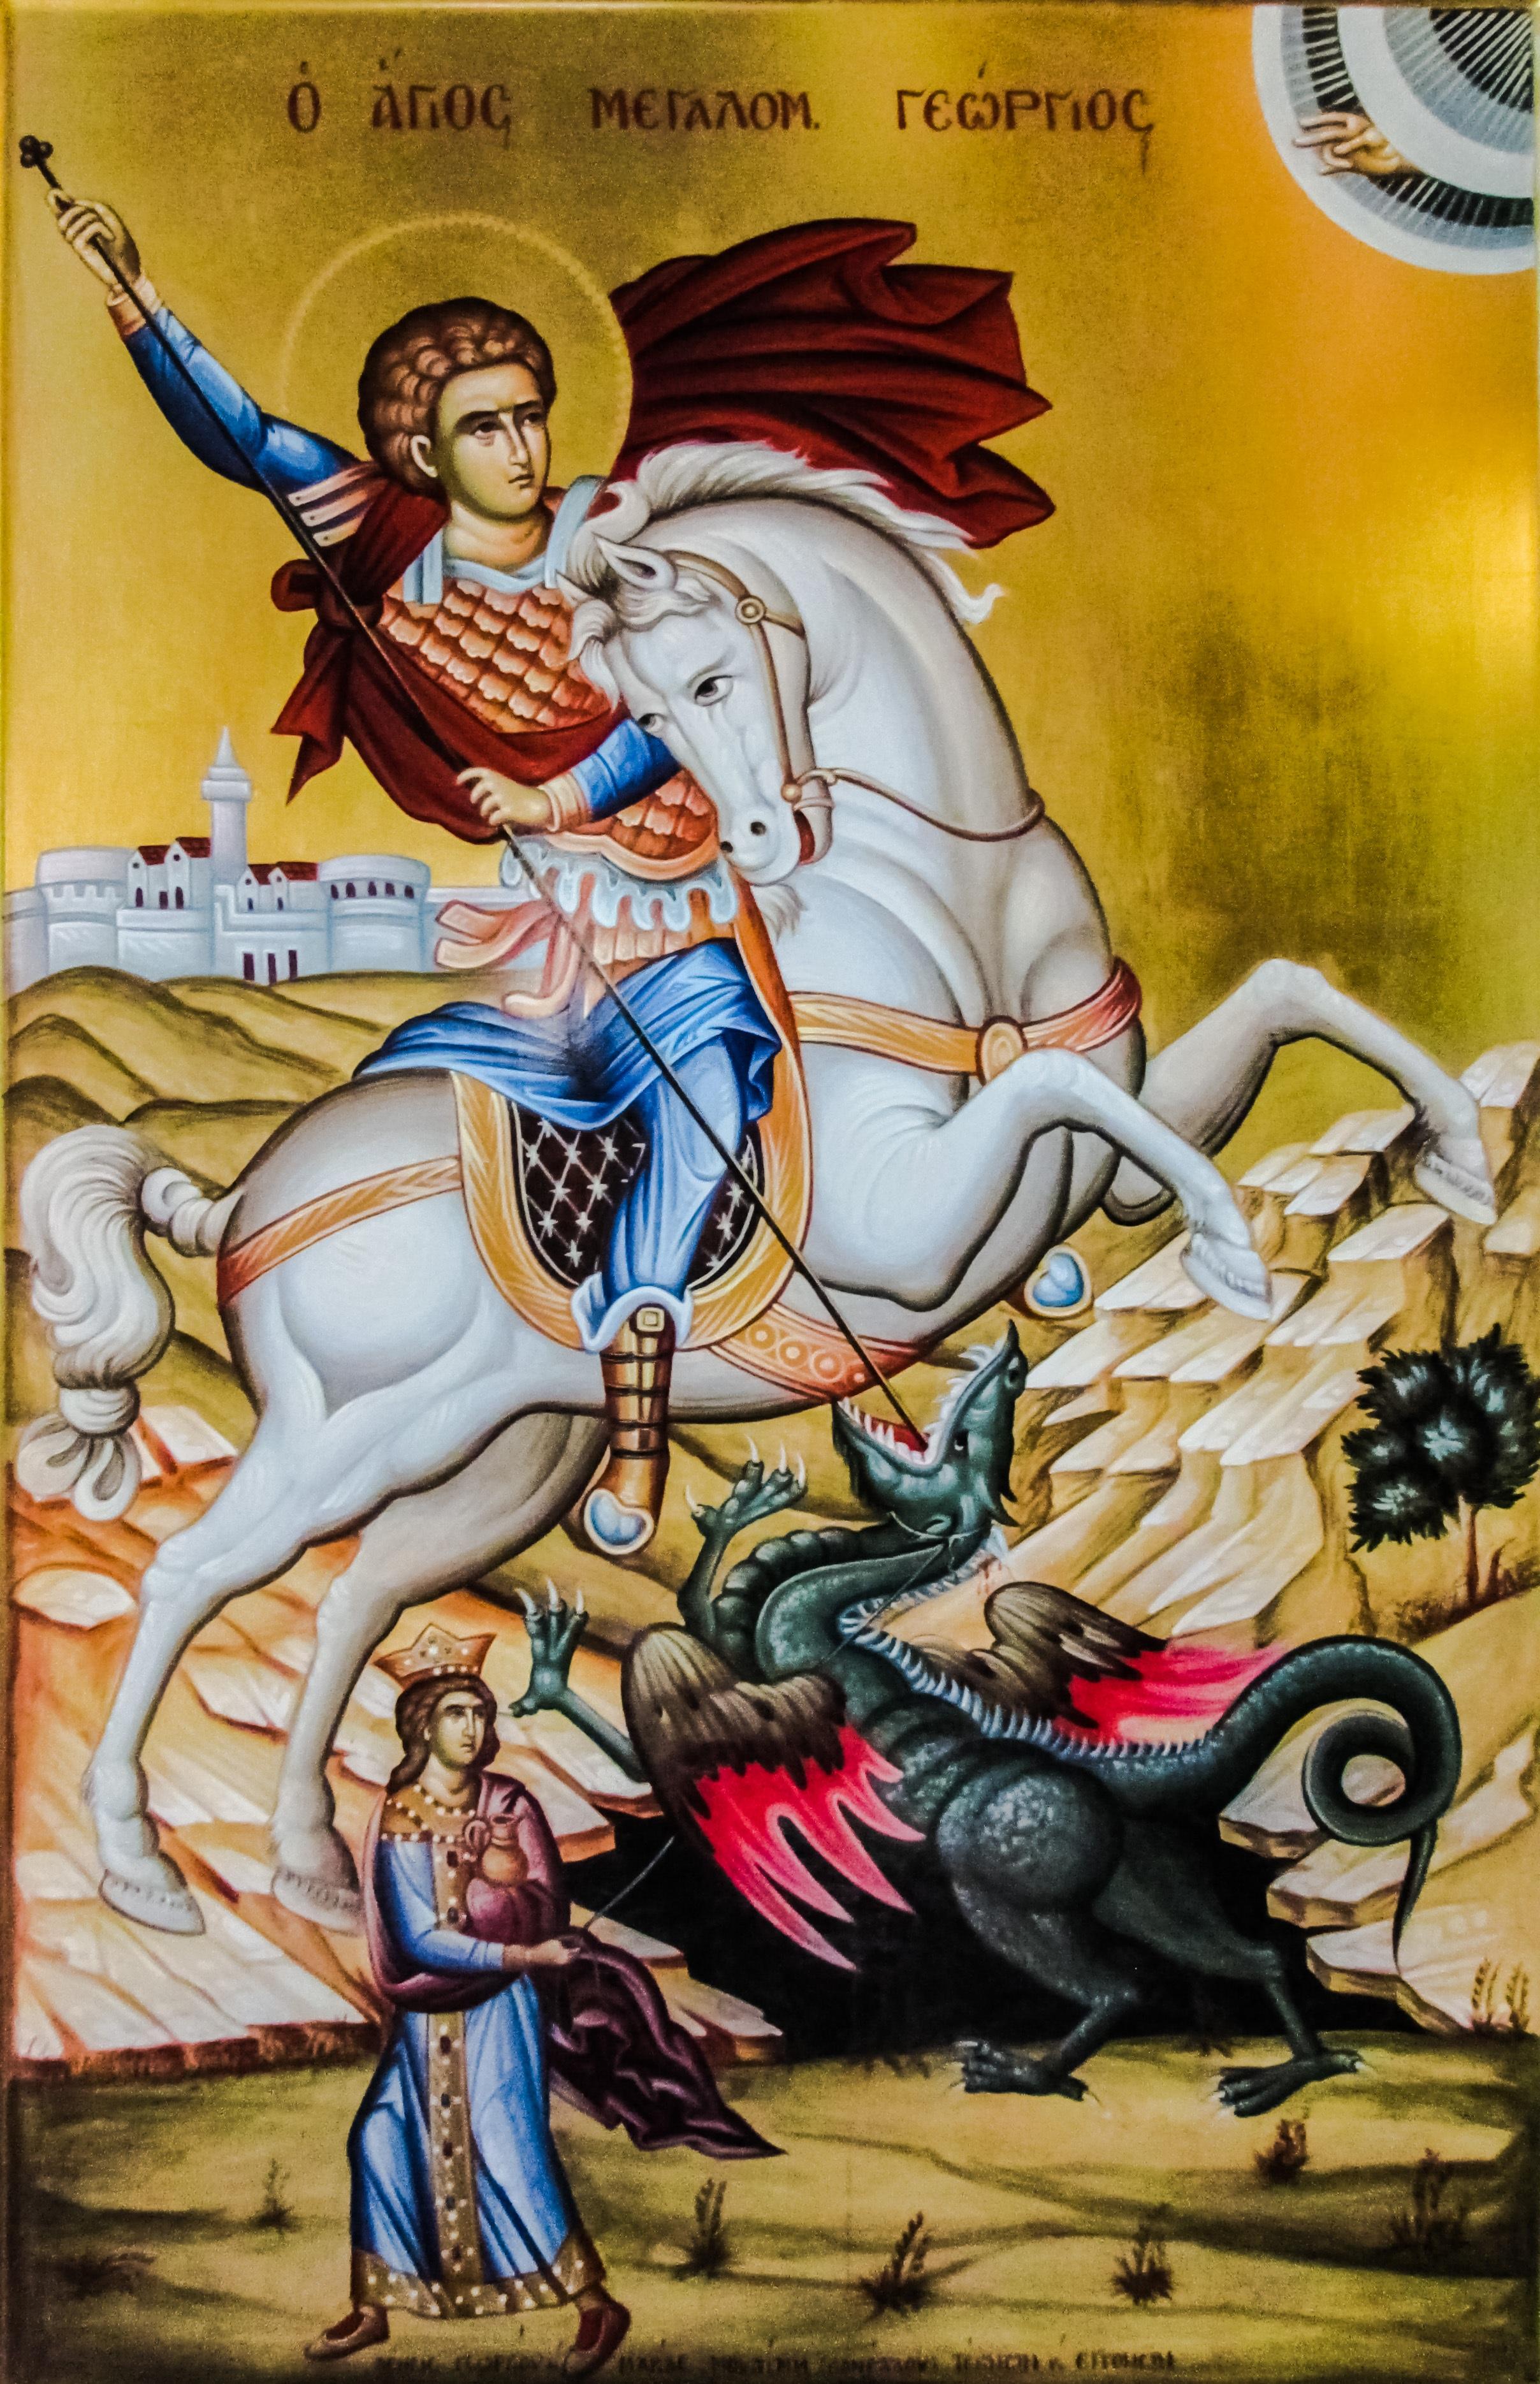 Gambar Agama Gereja Lukisan Ilustrasi Ikonografi Santo Naga